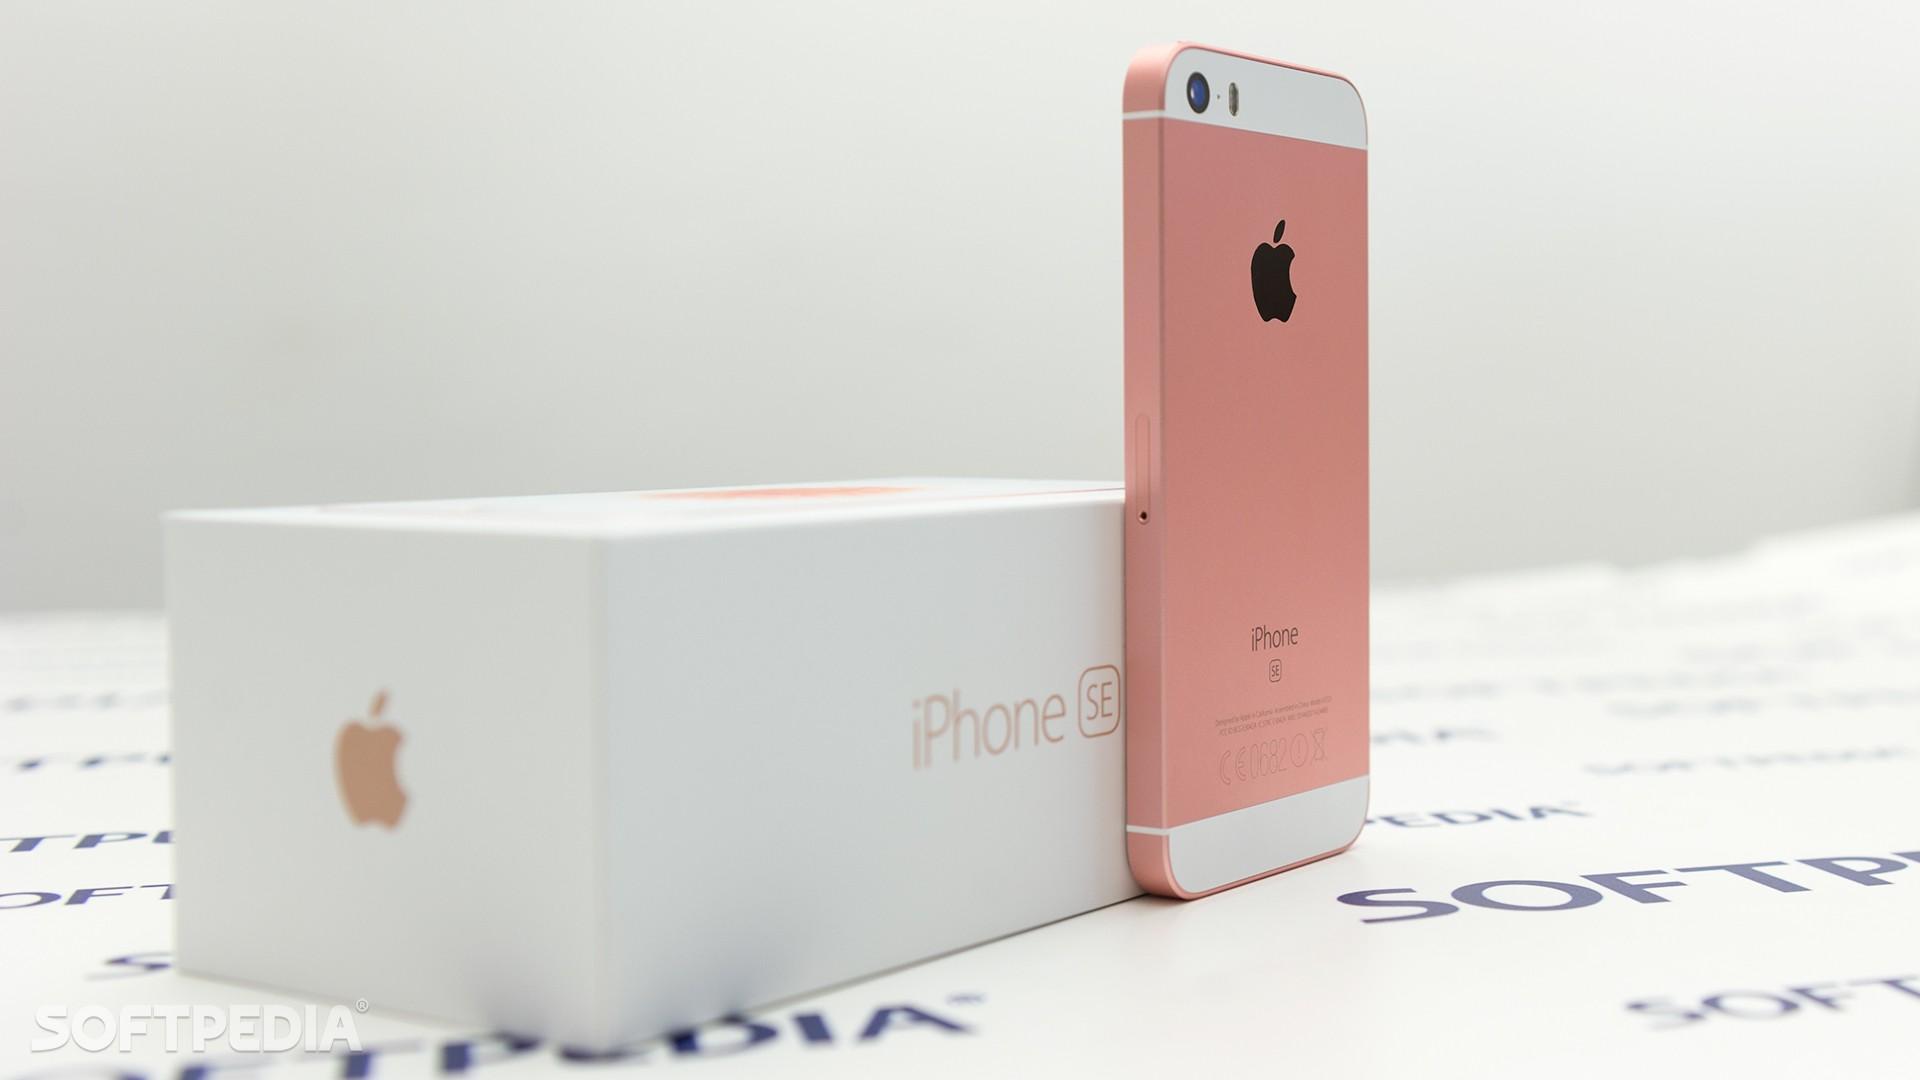 A S Design apple could hold back iphone se 2 until september as design not yet